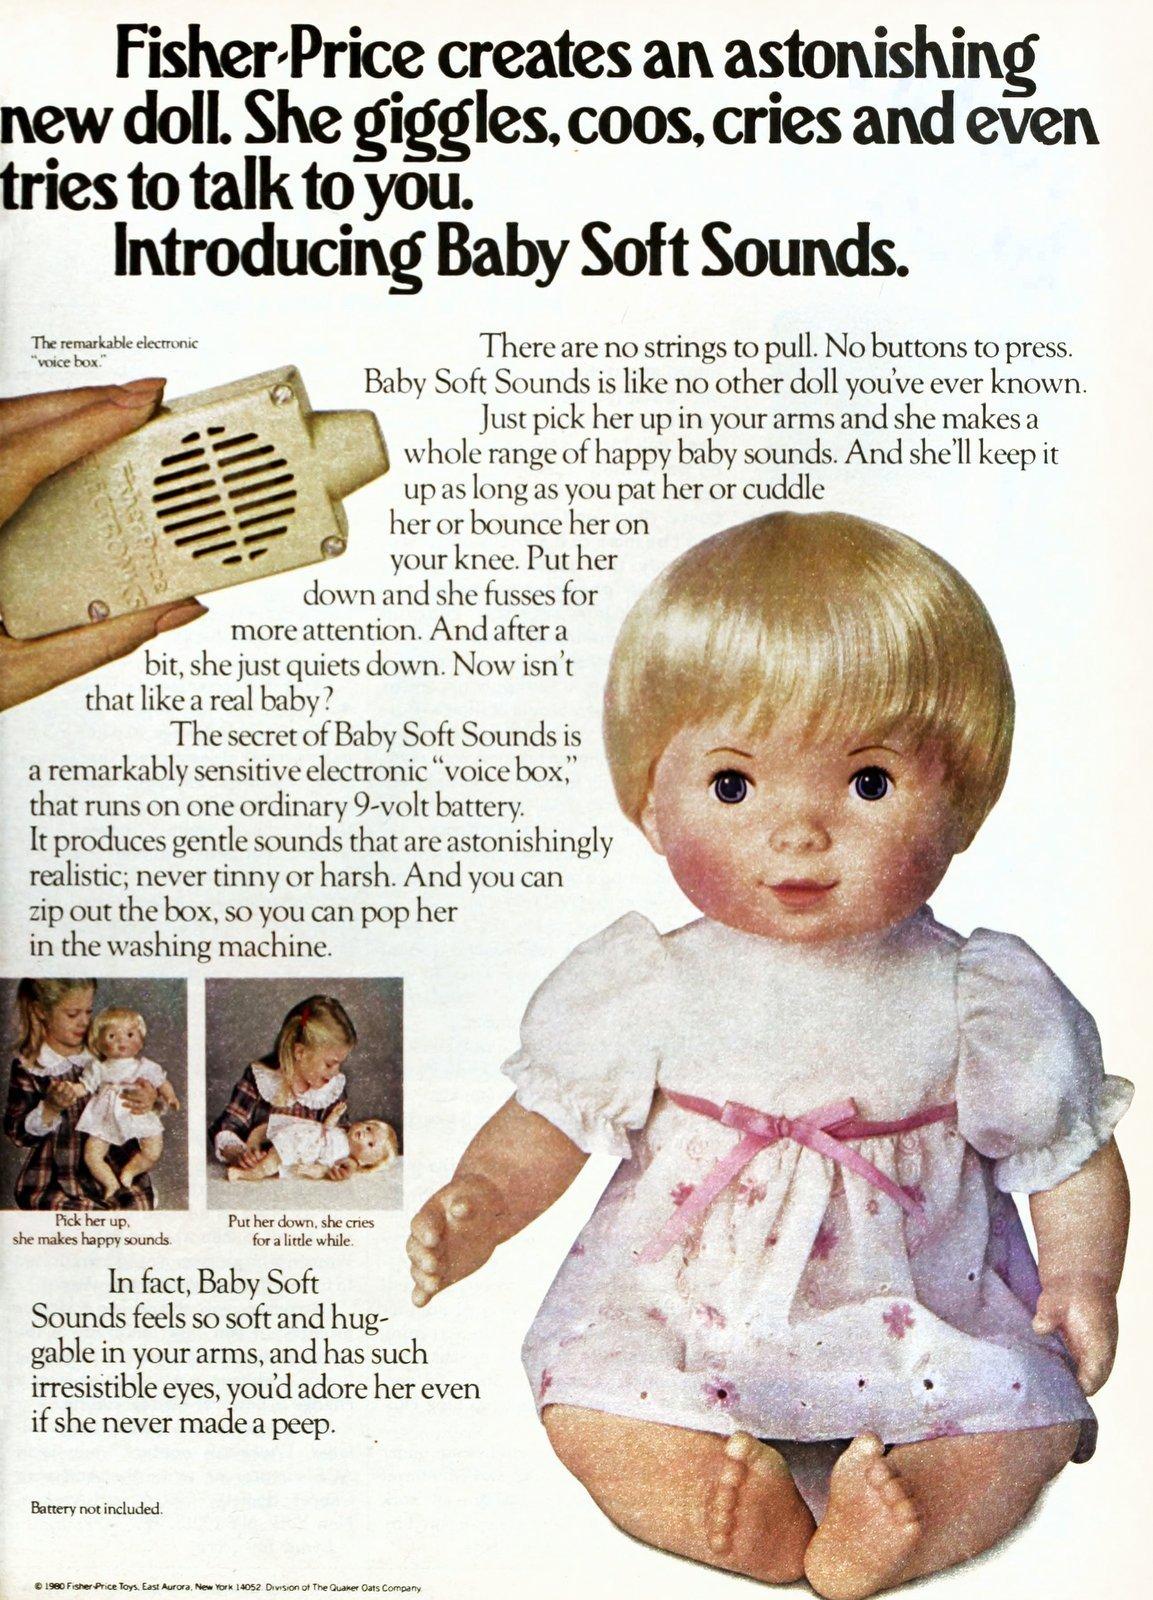 Retro Baby Soft Sounds doll (1980)